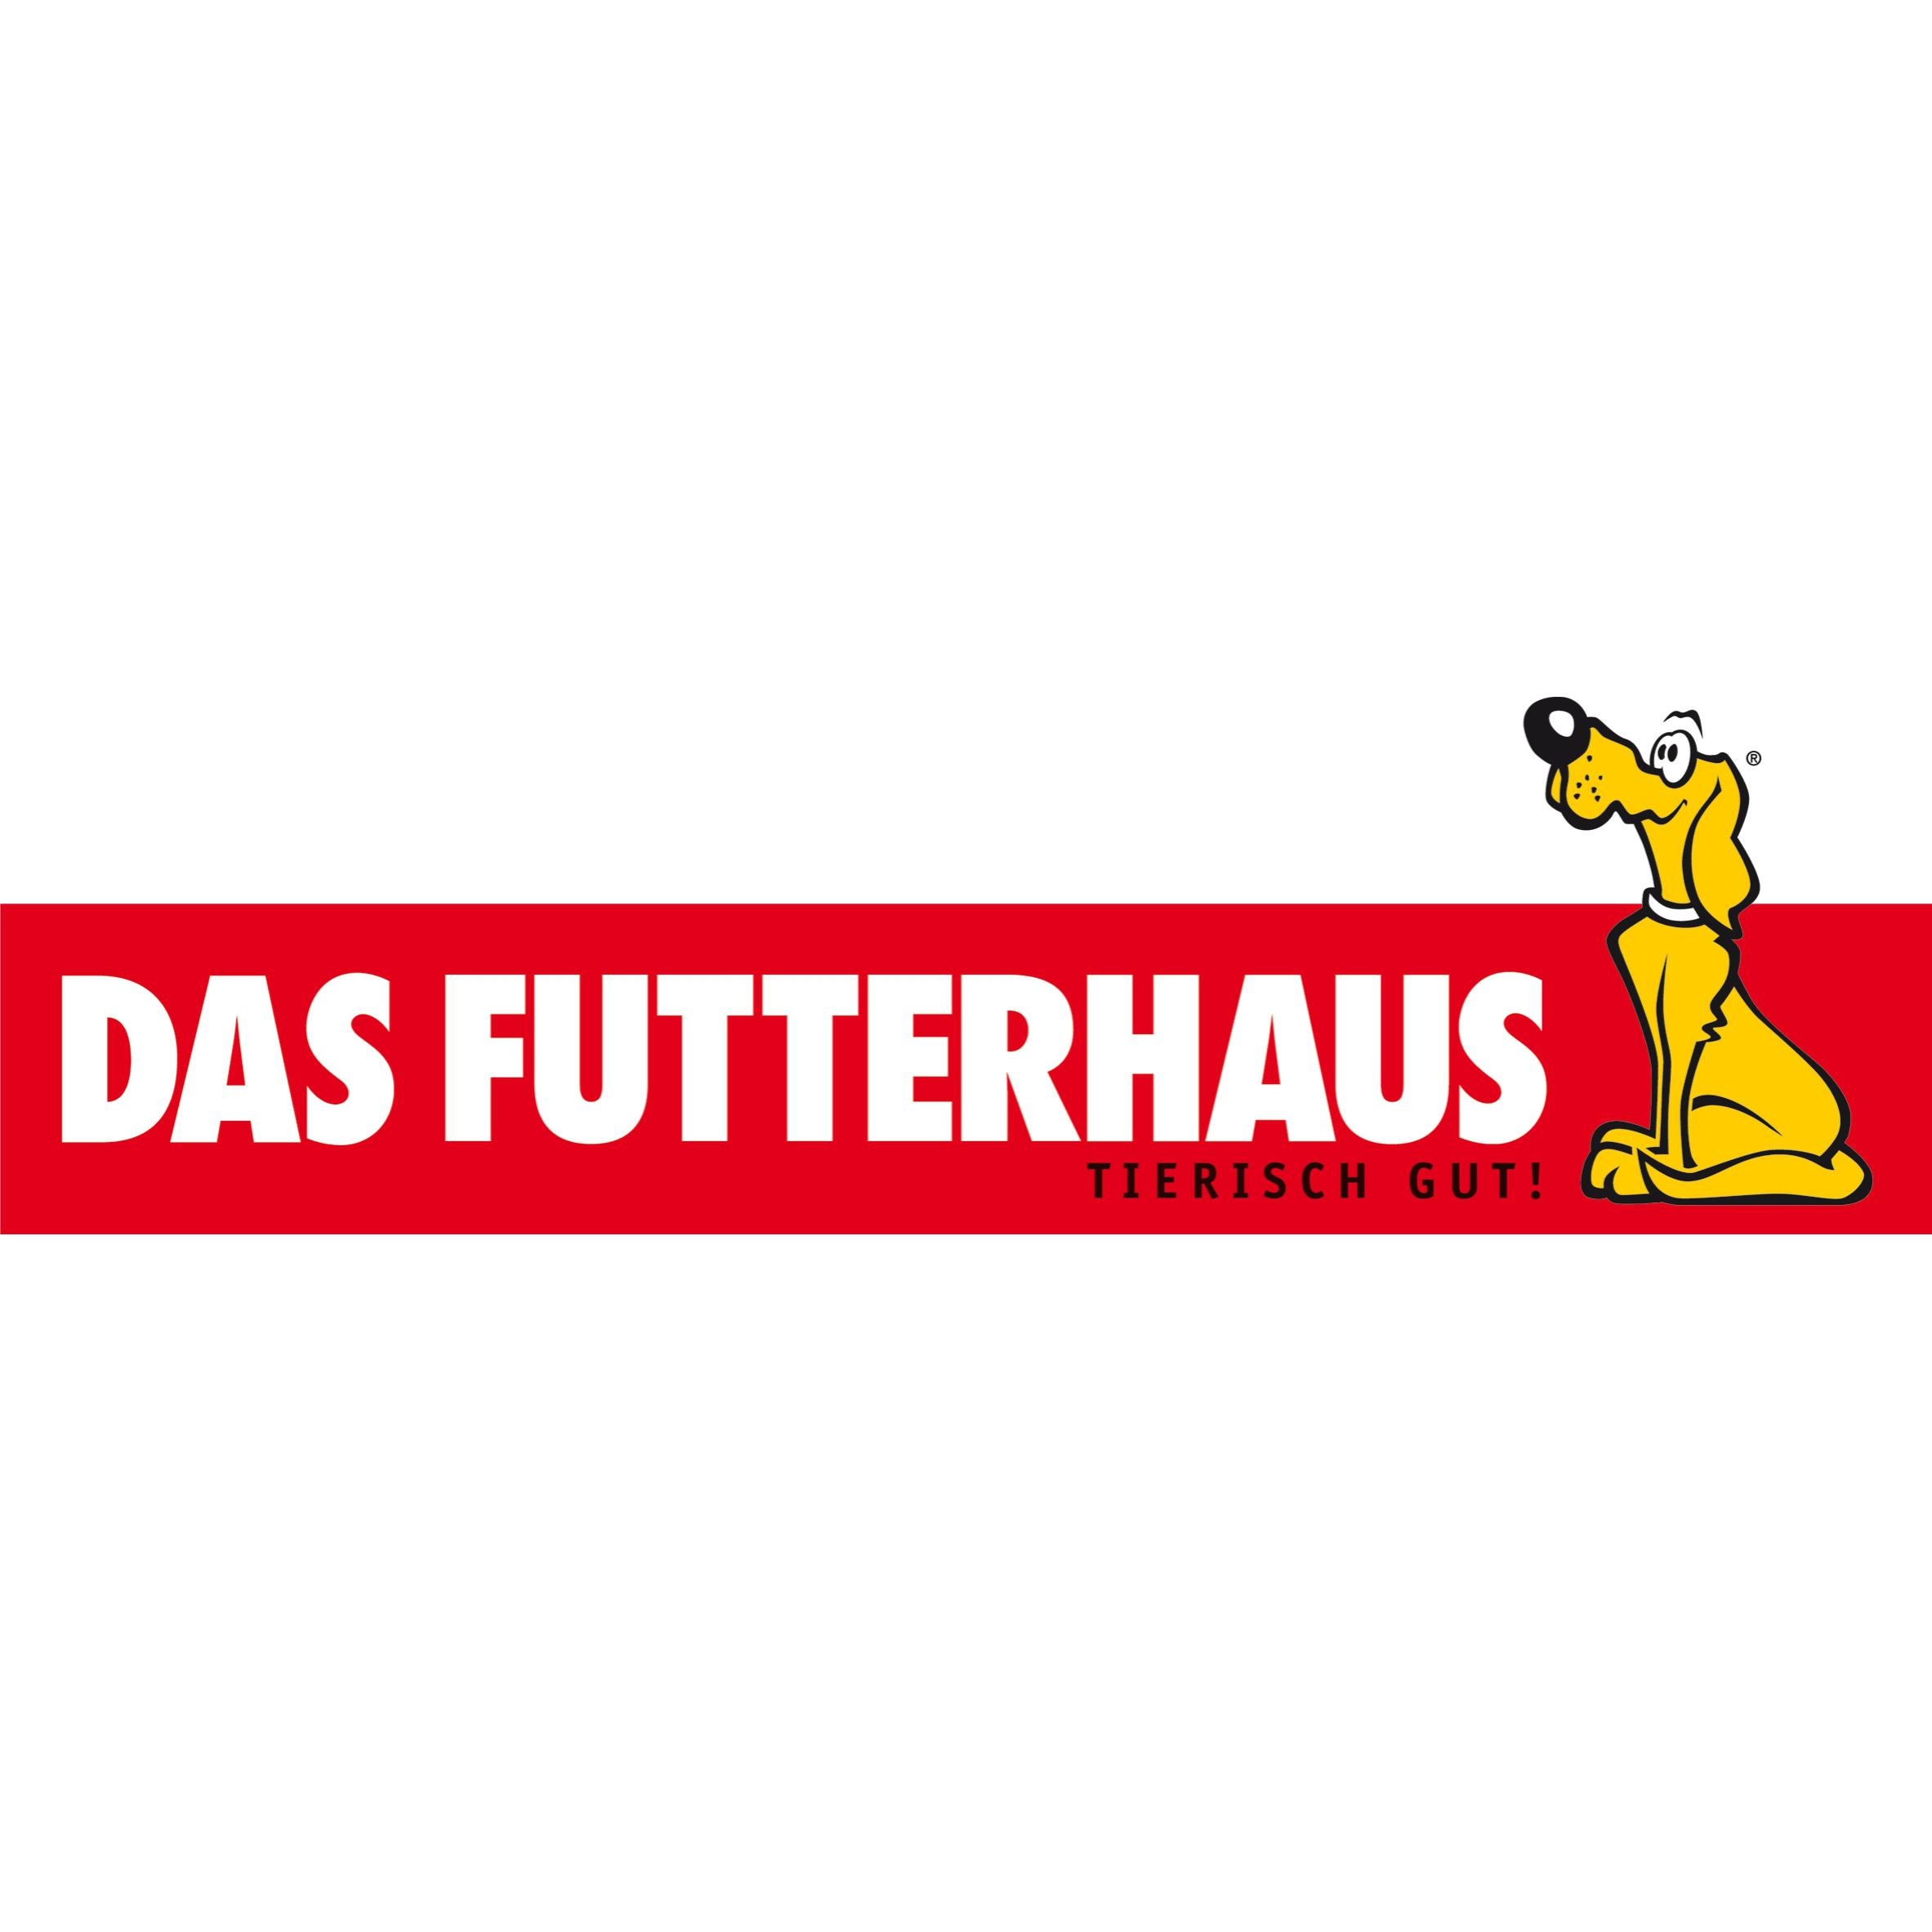 Bild zu Das Futterhaus Köln-Merheim, Olpener Str. 544, 51109 Köln in Köln